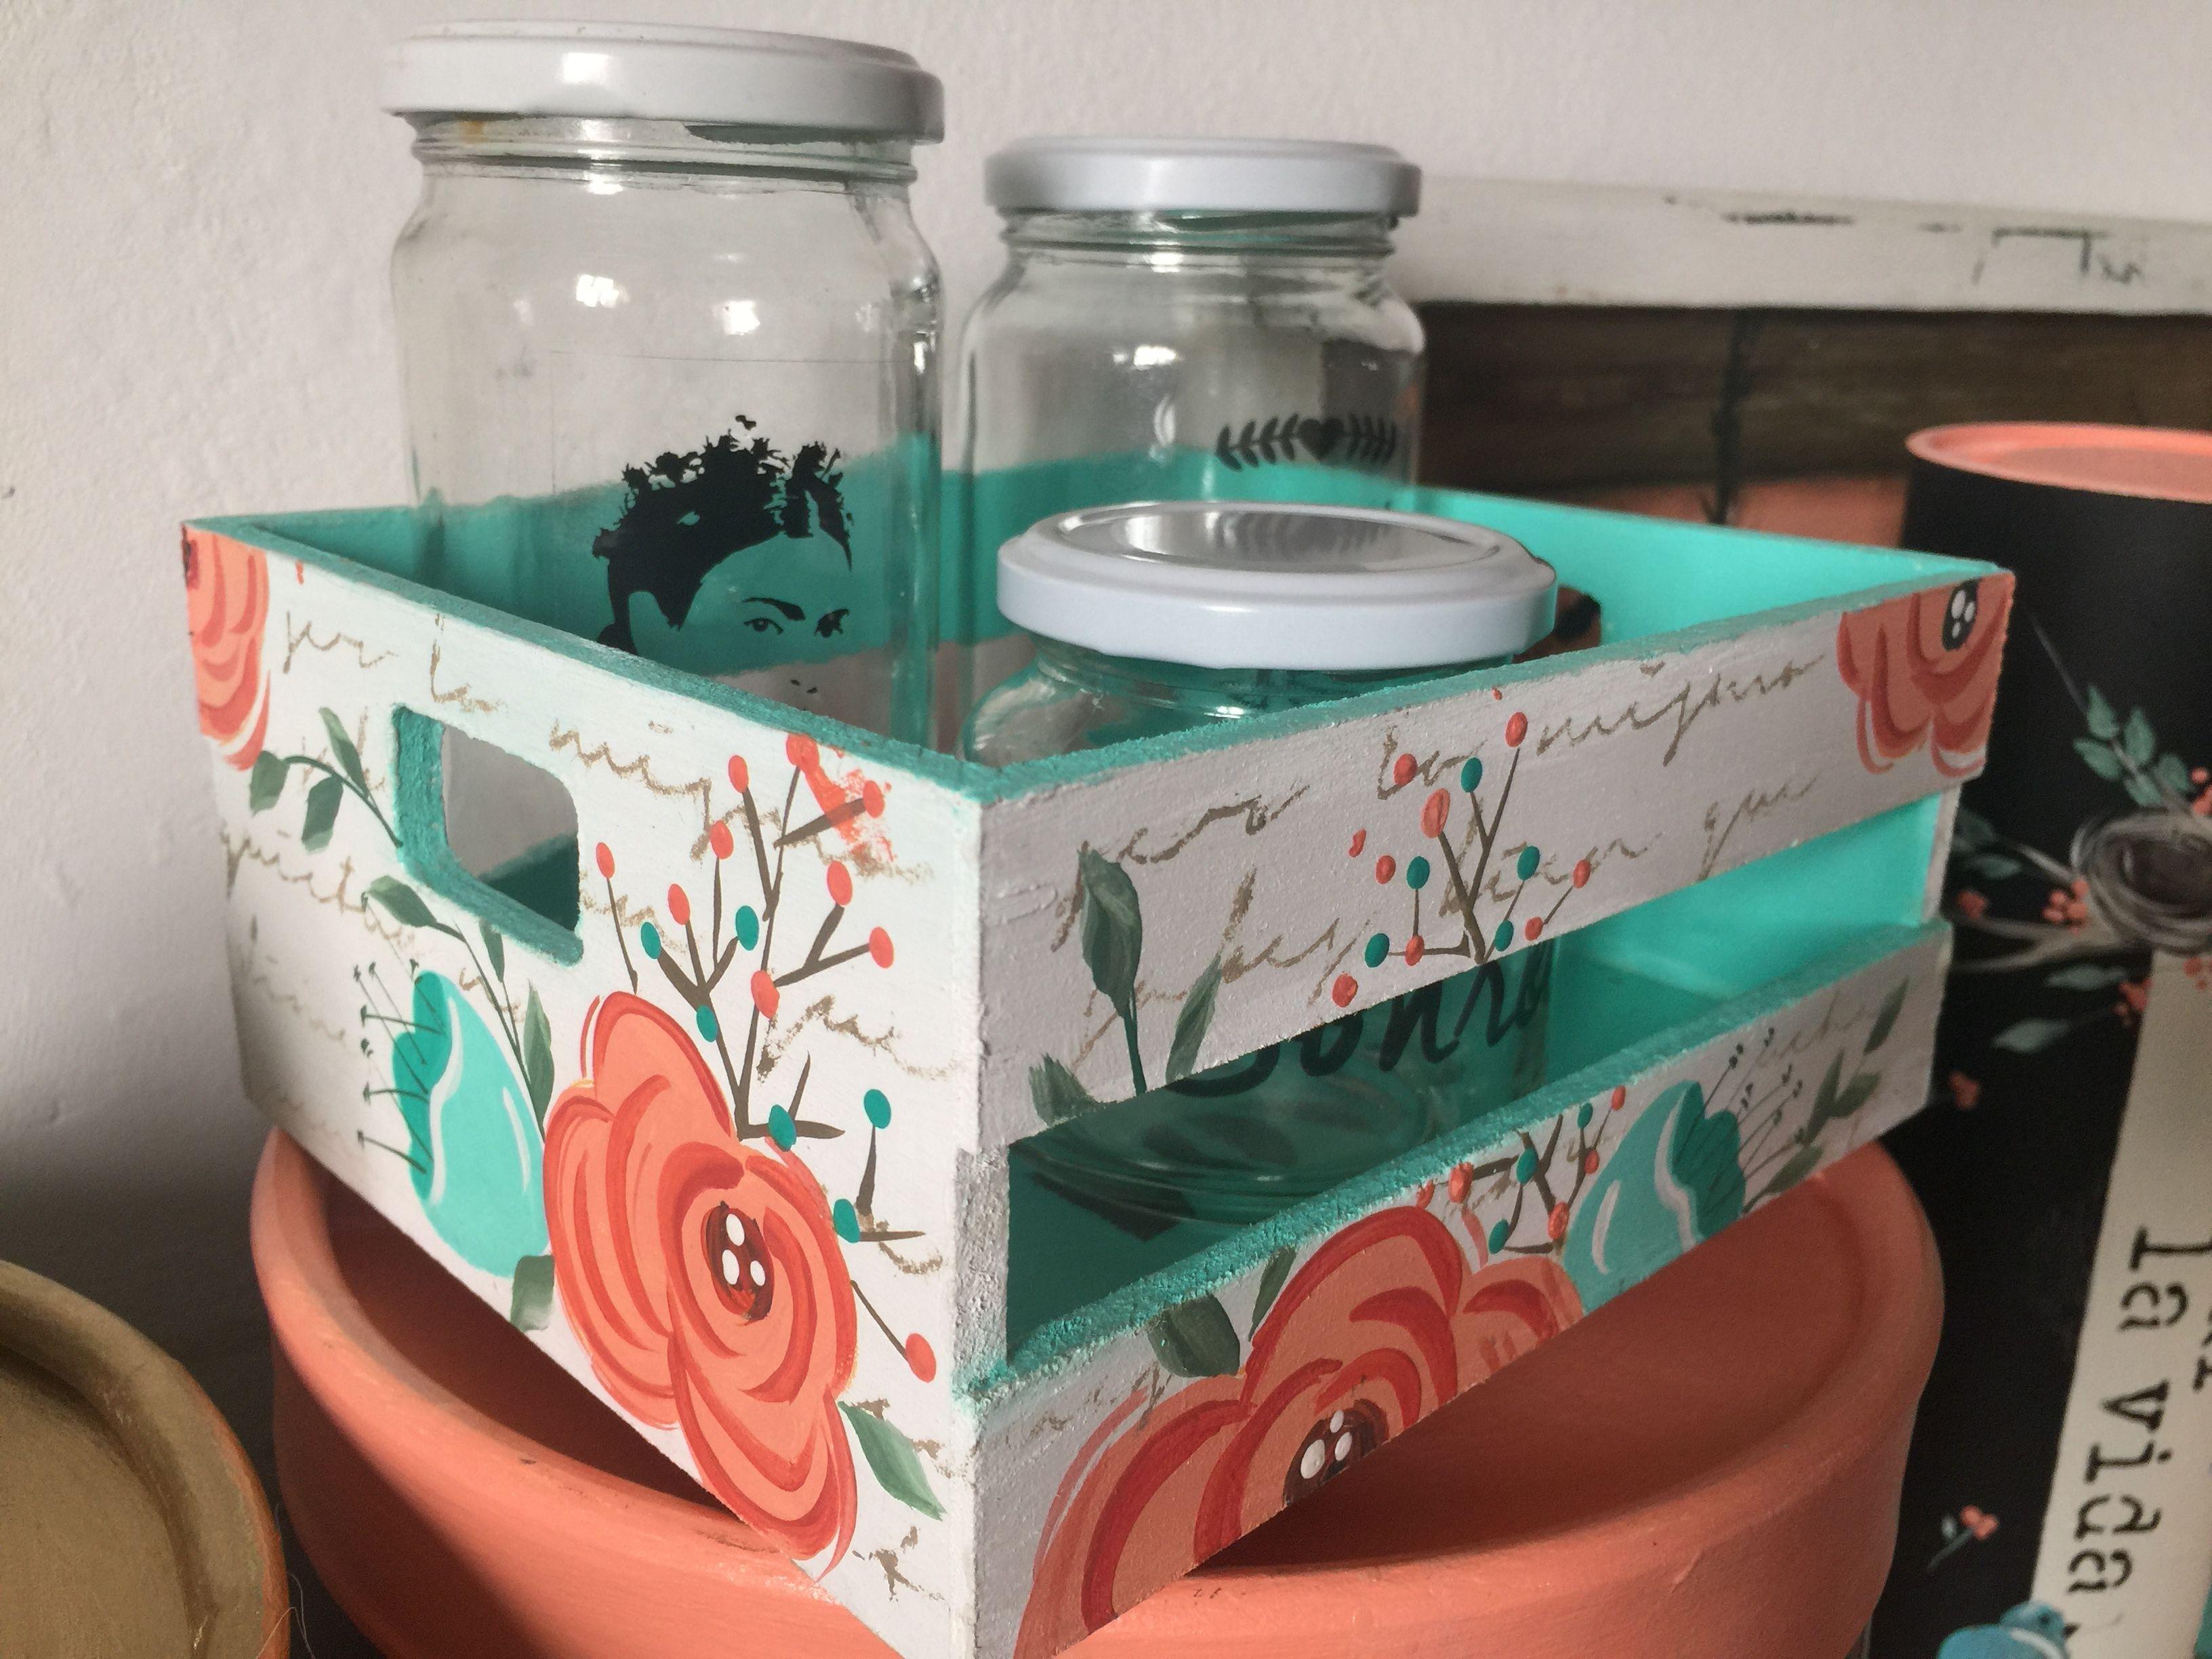 Restoration, Good Ideas, Build Your Own, Painted Ornaments, Mason Jars,